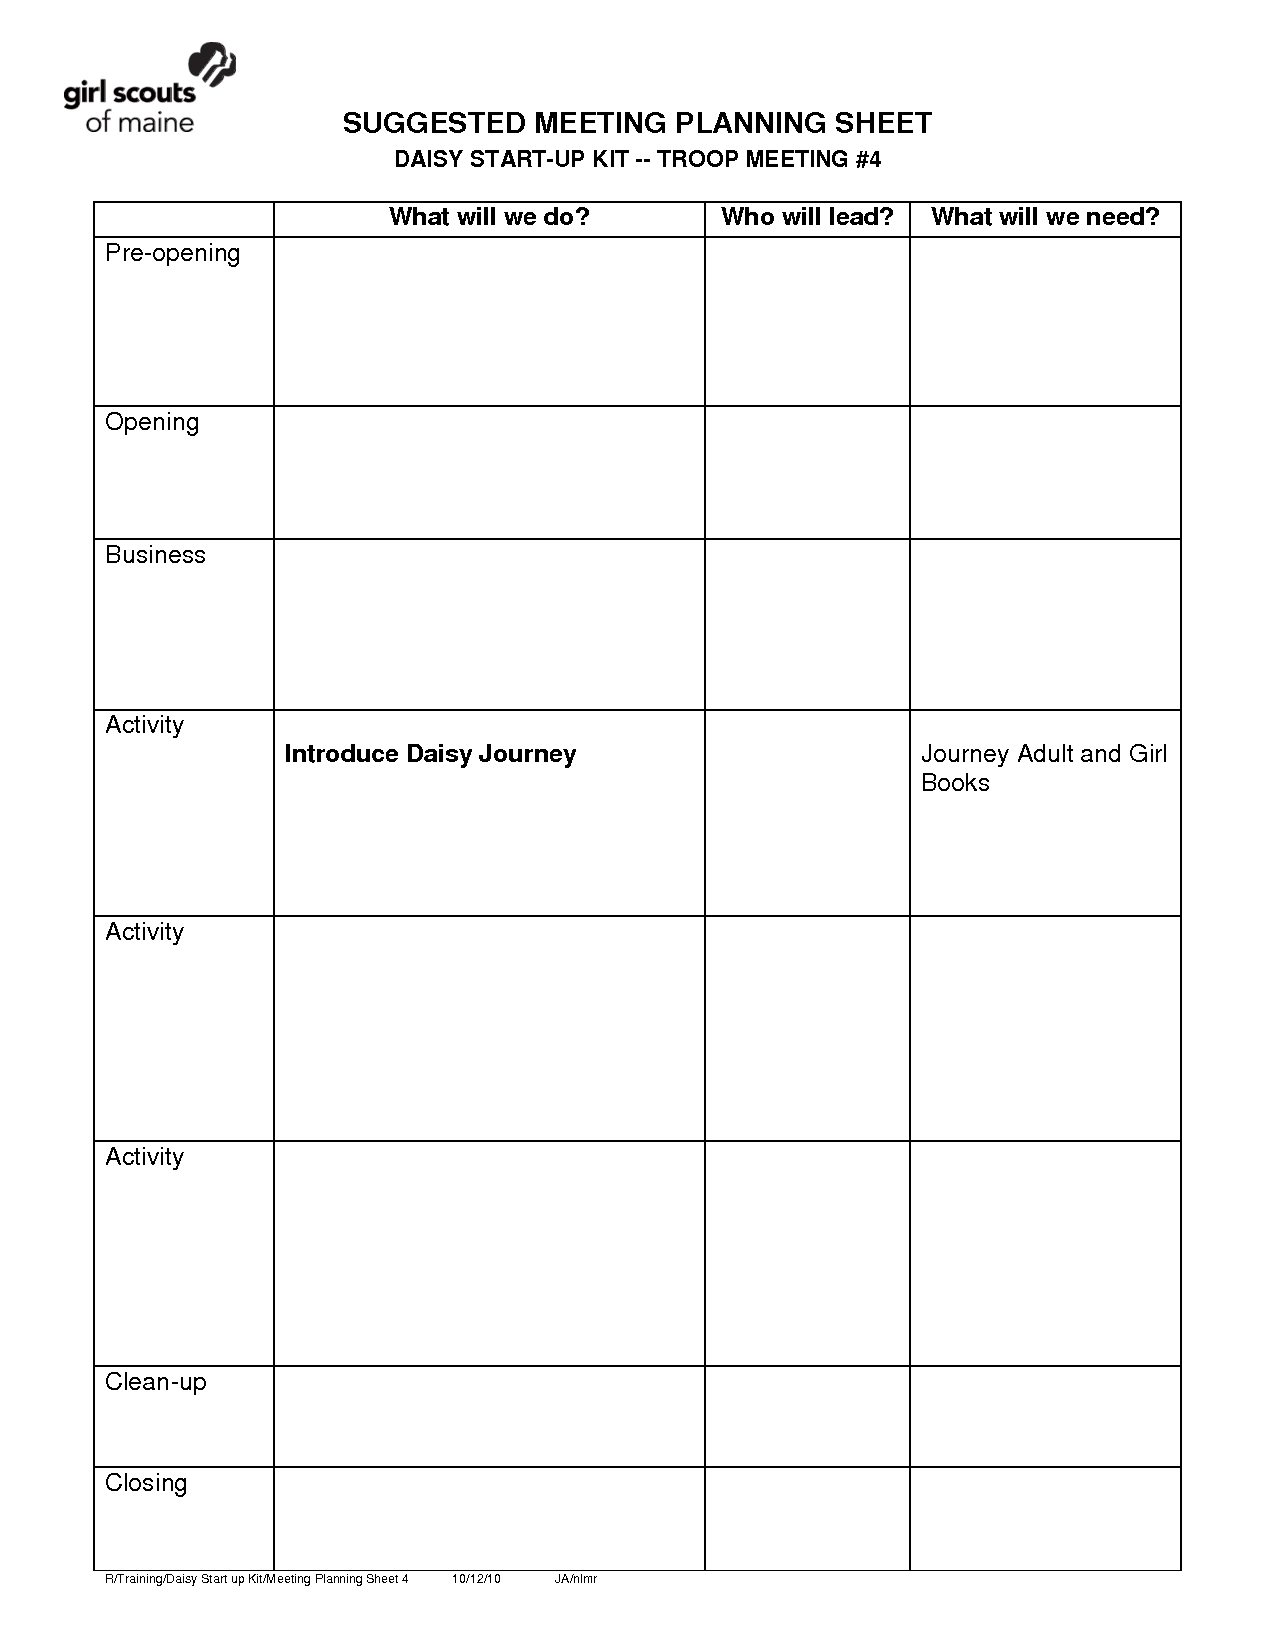 Girl Scout Travel Budget Worksheet